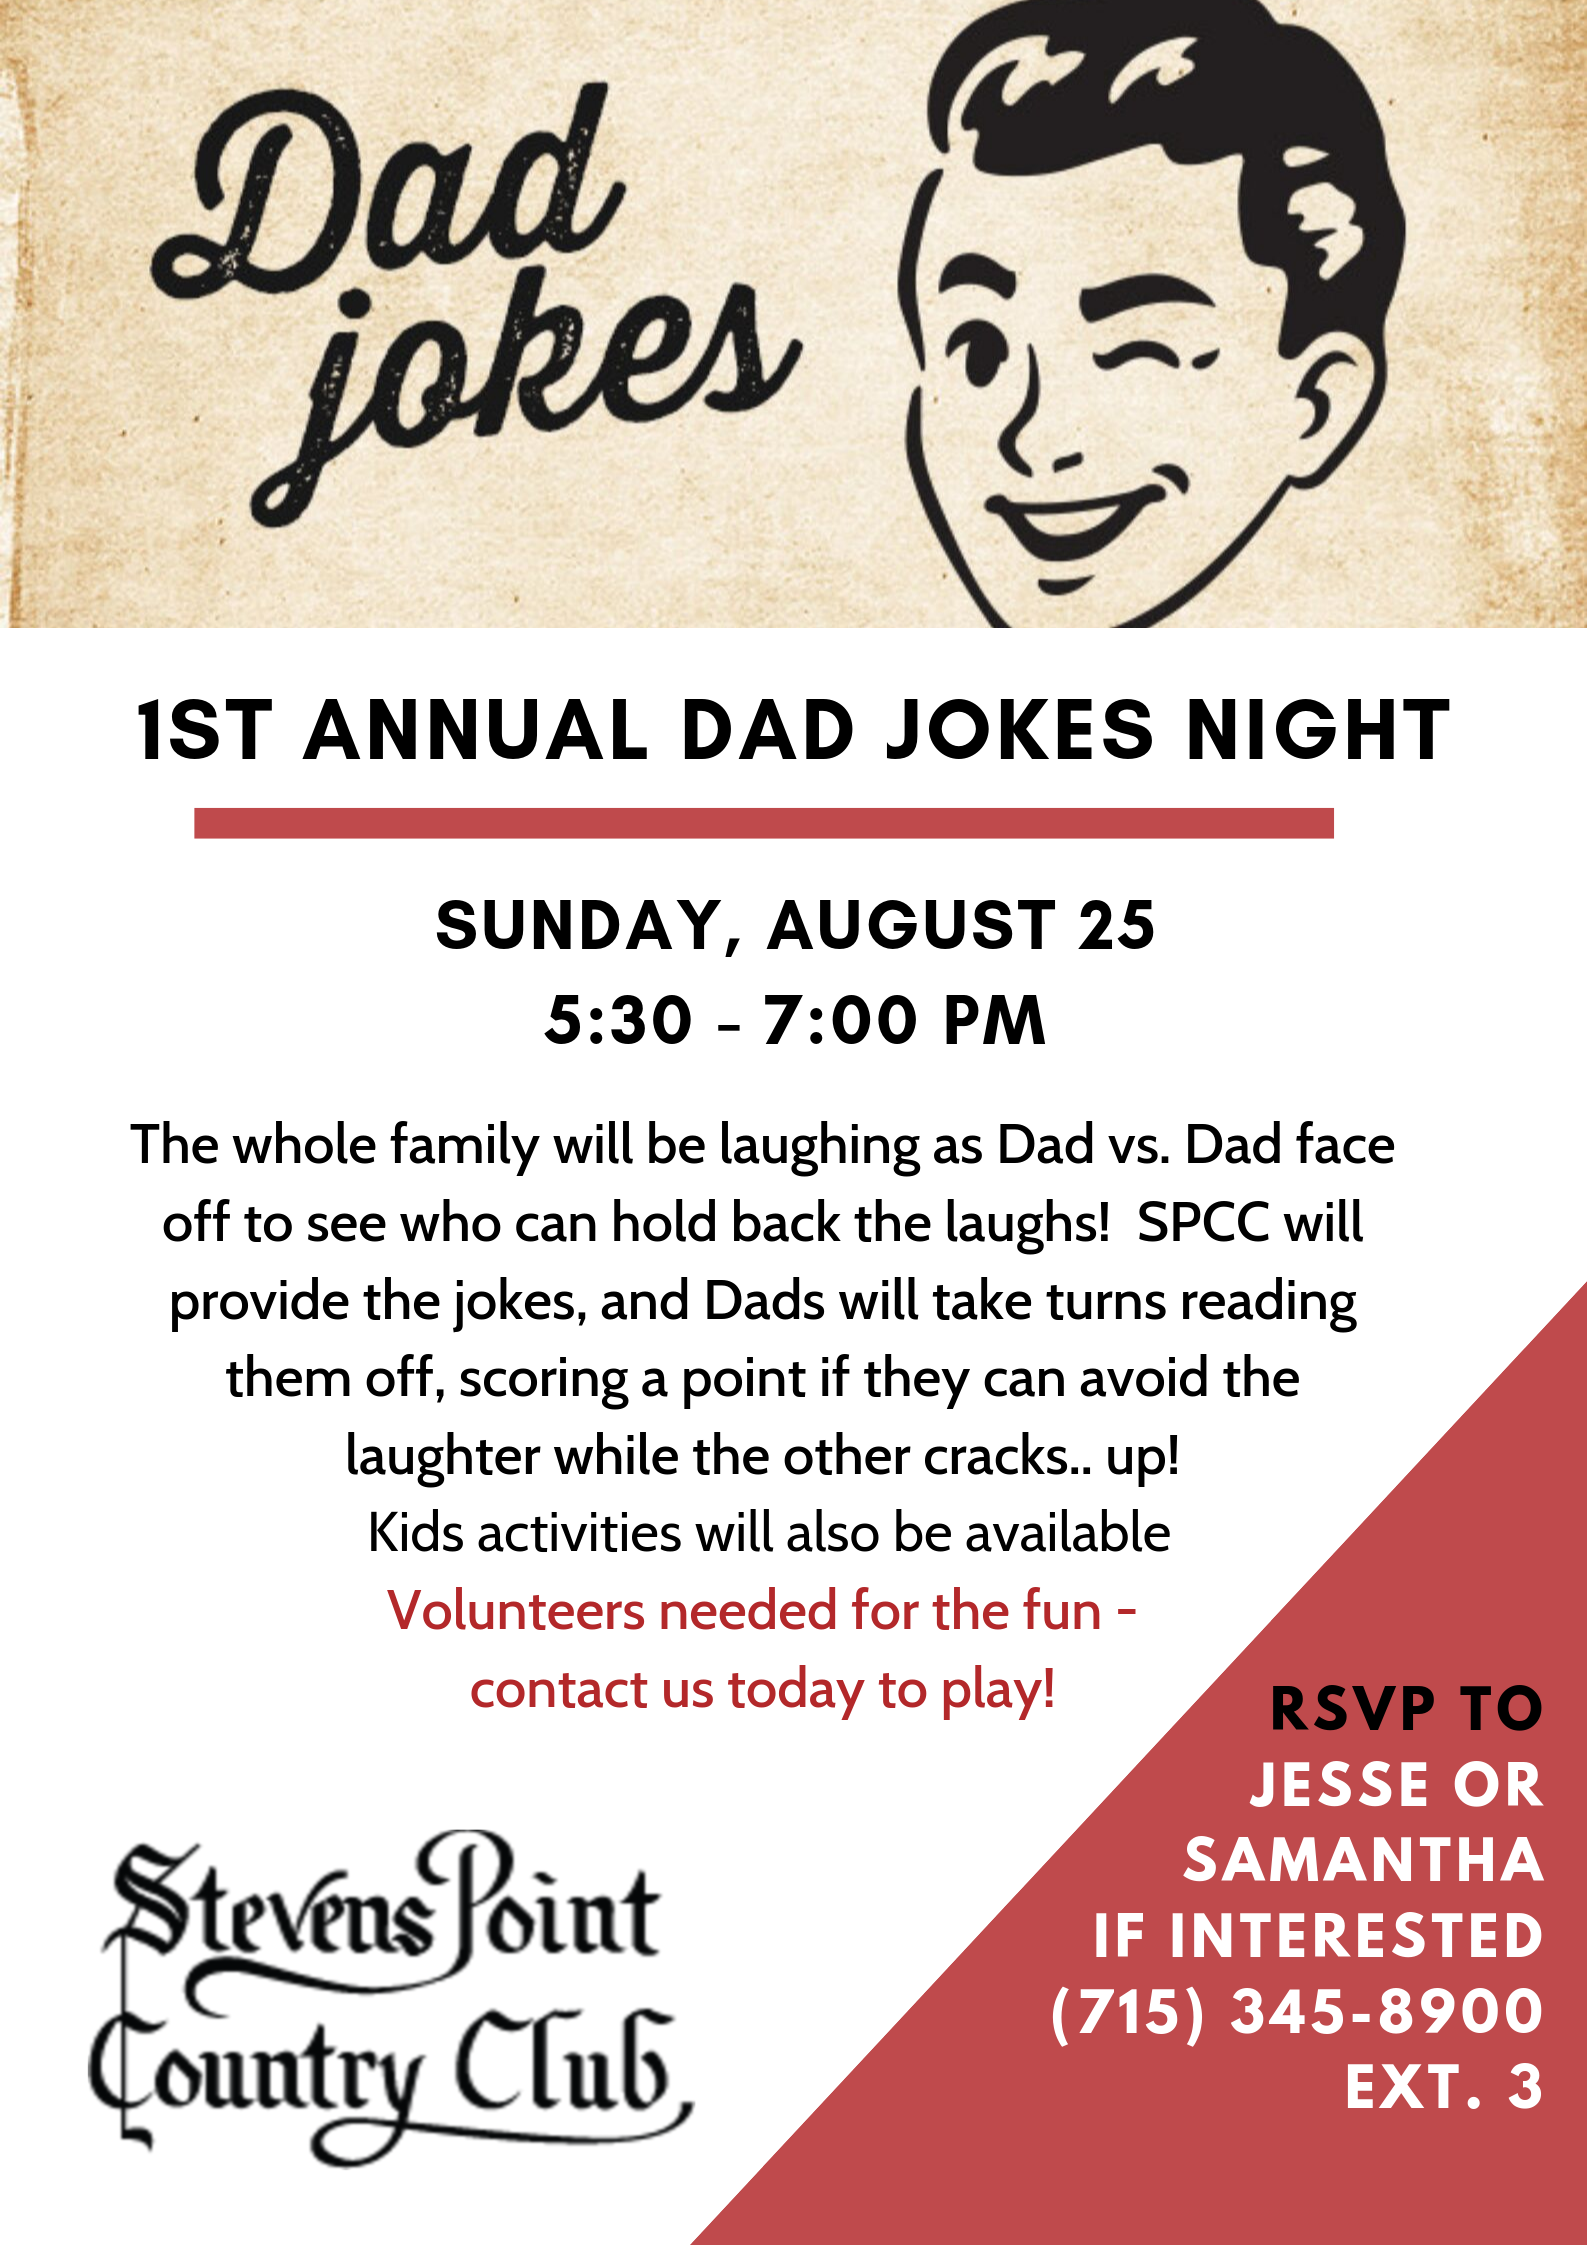 SPCC Dad Jokes Night flyer.png